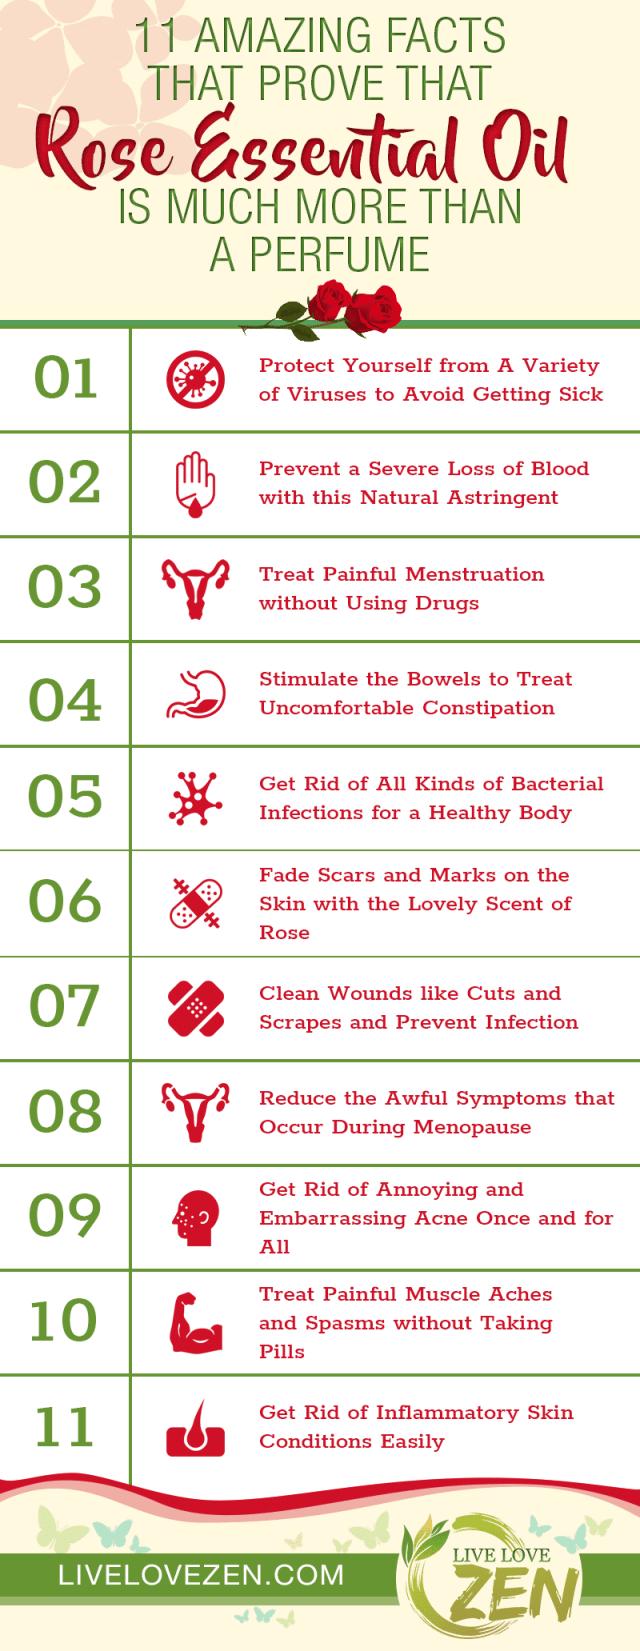 rose essential oil health benefits